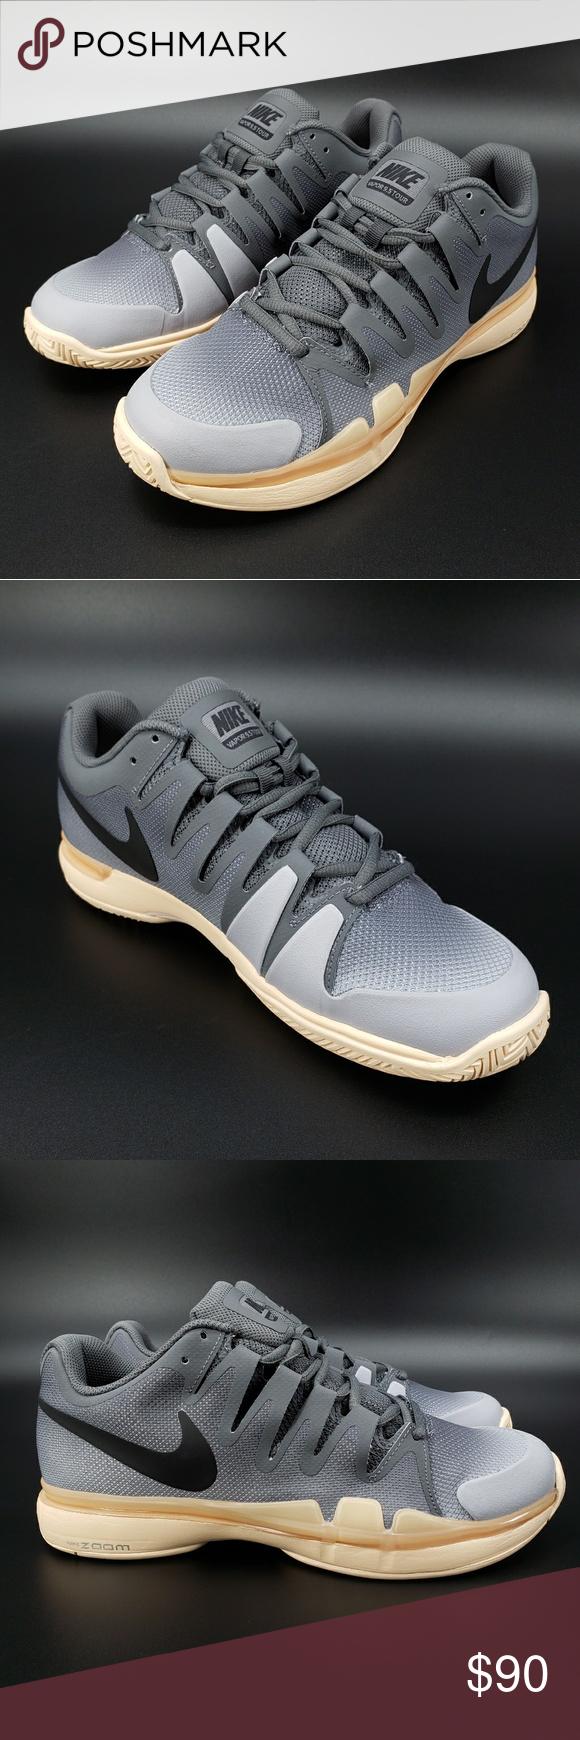 reputable site 6edf0 8532c Nike Zoom Vapor 9.5 Tour Tennis Shoes 631475 004 Nike Zoom Vapor 9.5 Tour  Tennis Shoes